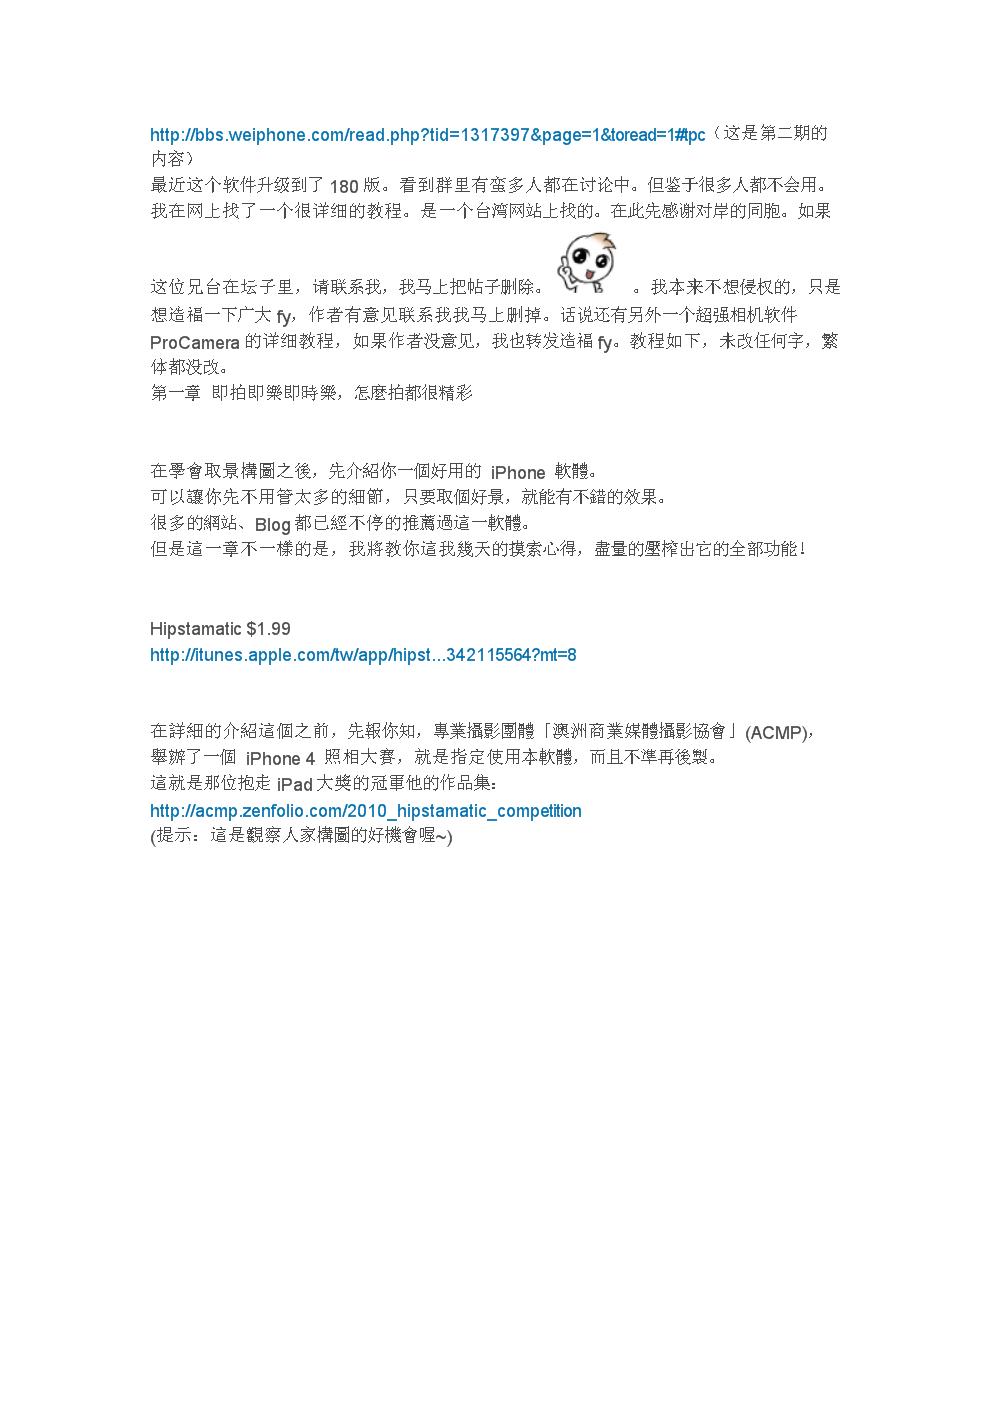 Hipstamatic最牛的摄影软件终极教程.docx